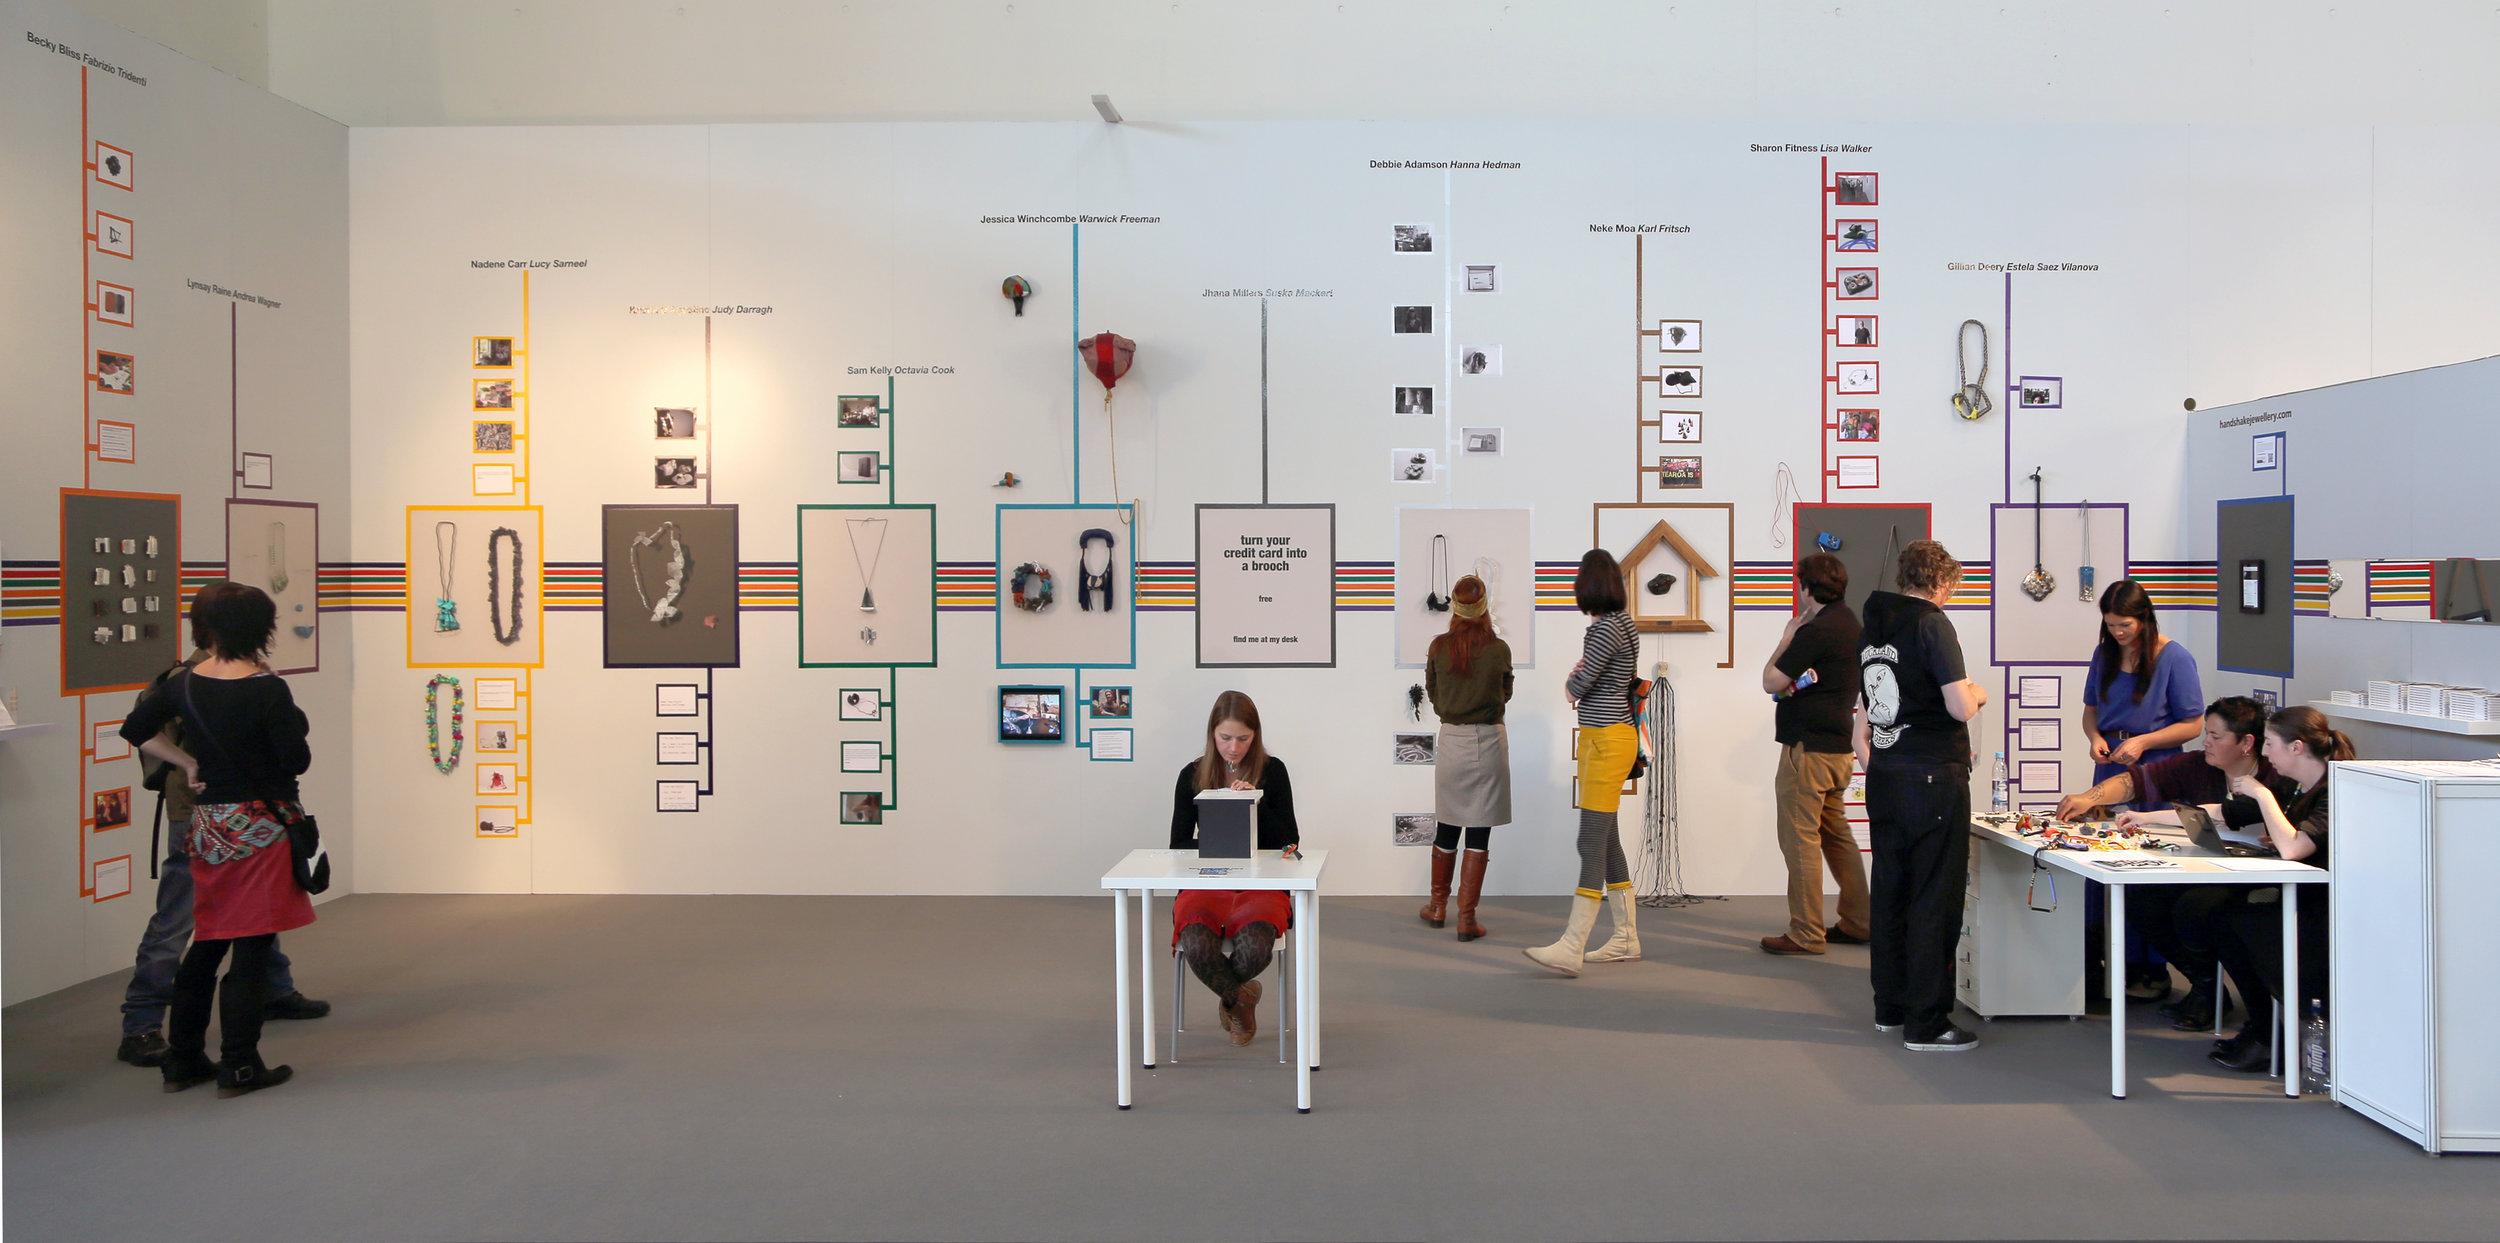 Handshake 1 presentation at the FRAME galleries, Internationale Handwerkmesse, Munich, 2013. Image courtesy of Peter Deckers.